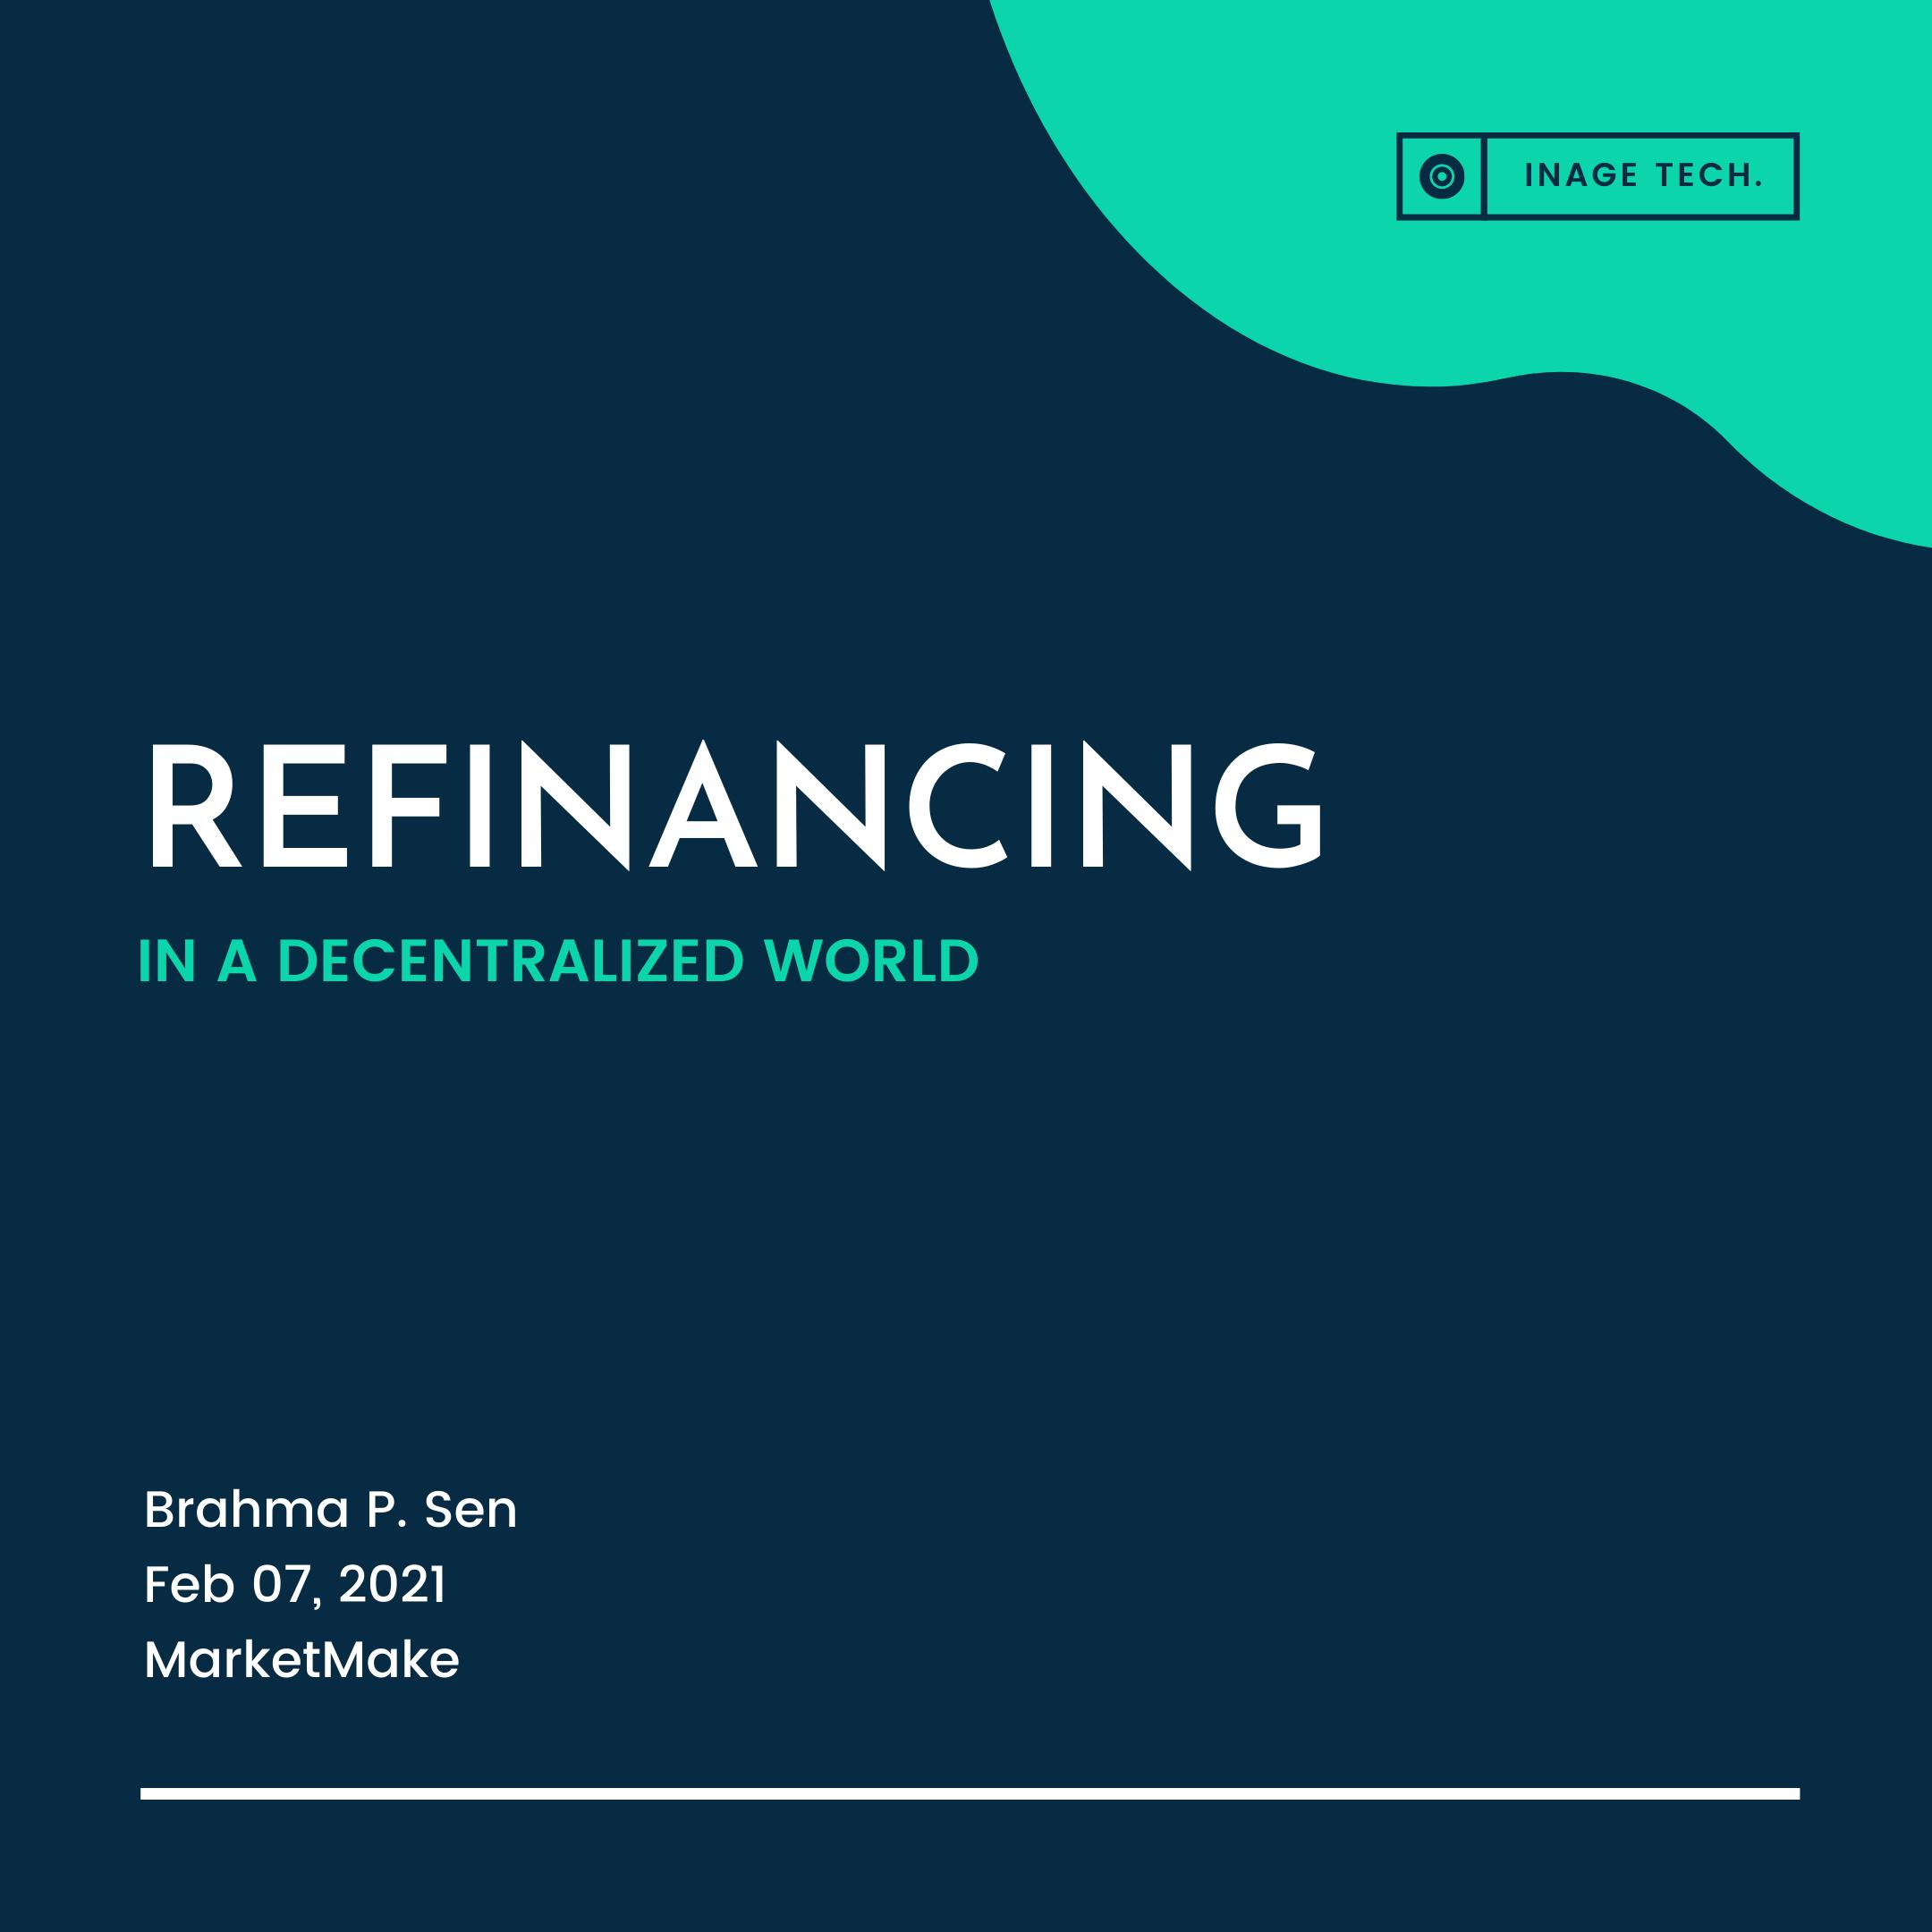 refi-loan showcase